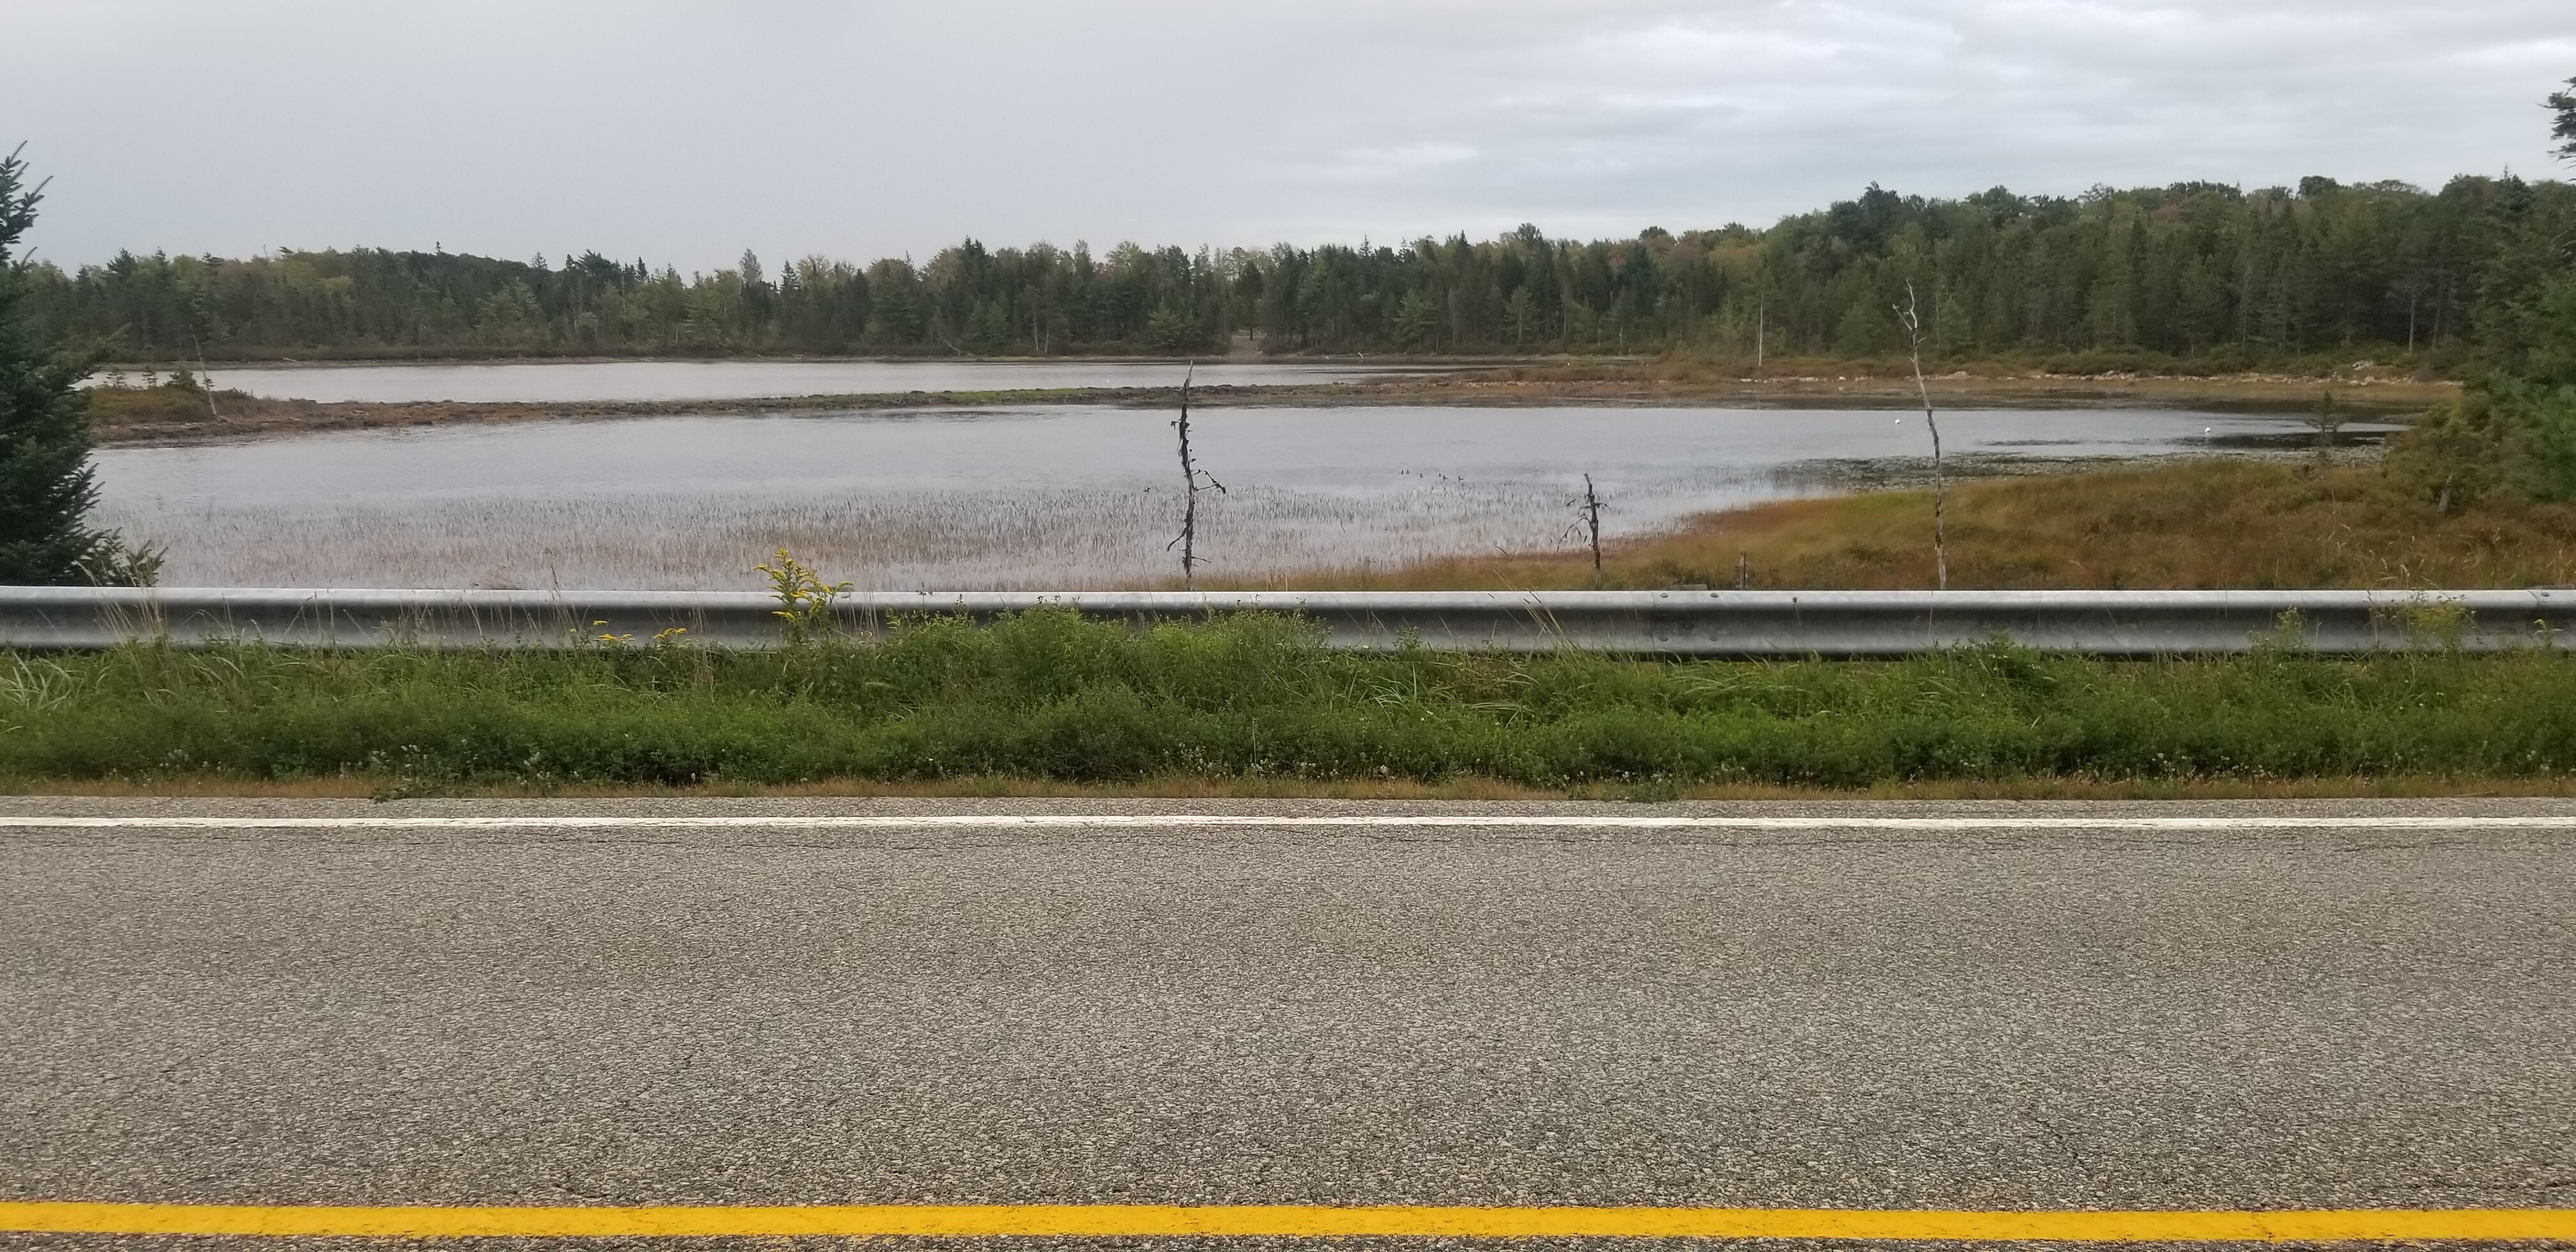 A highway runs next to a lake under a grey sky